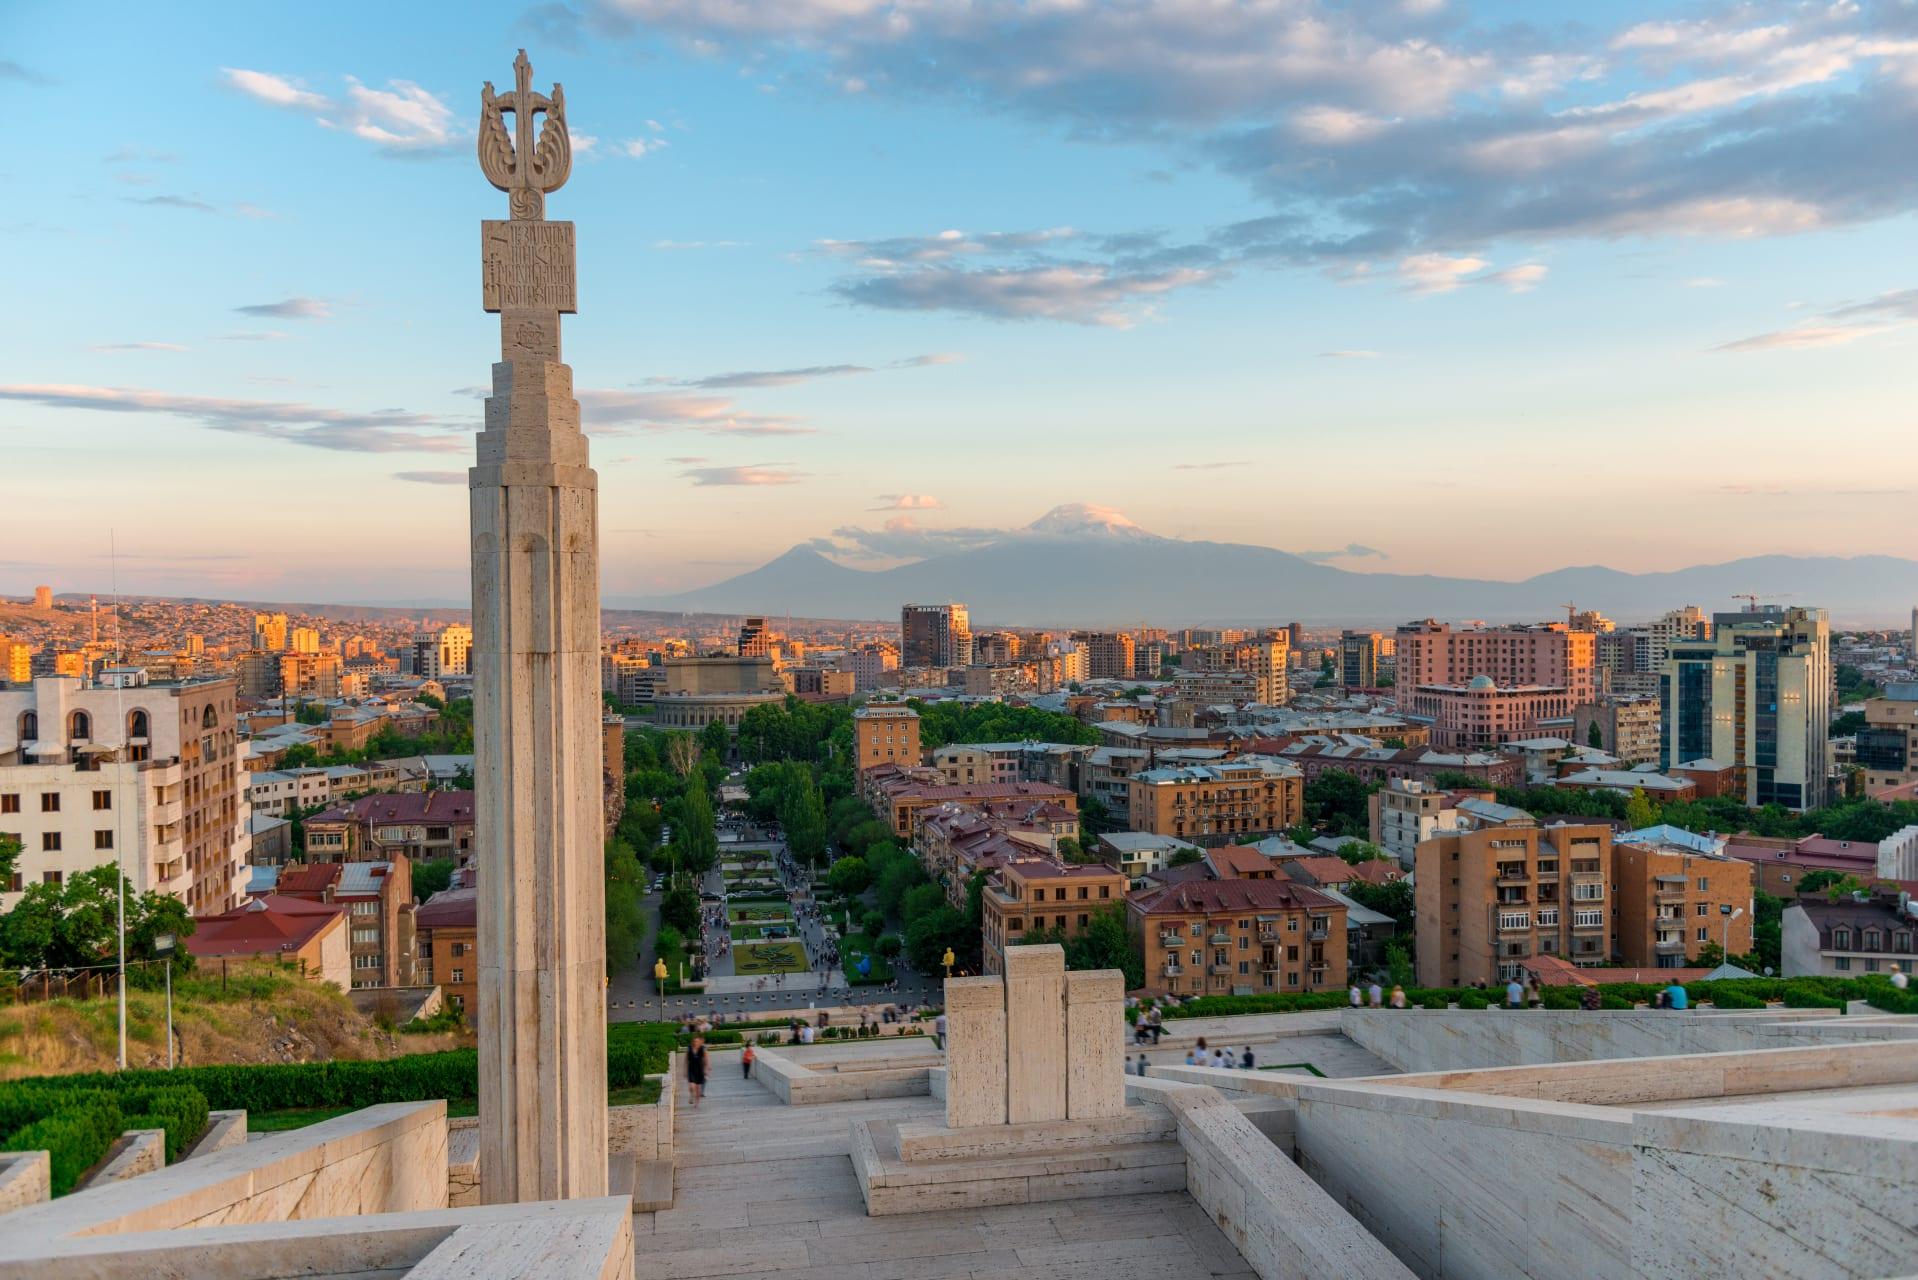 Yerevan - Evening Stroll through Yerevan City Centre